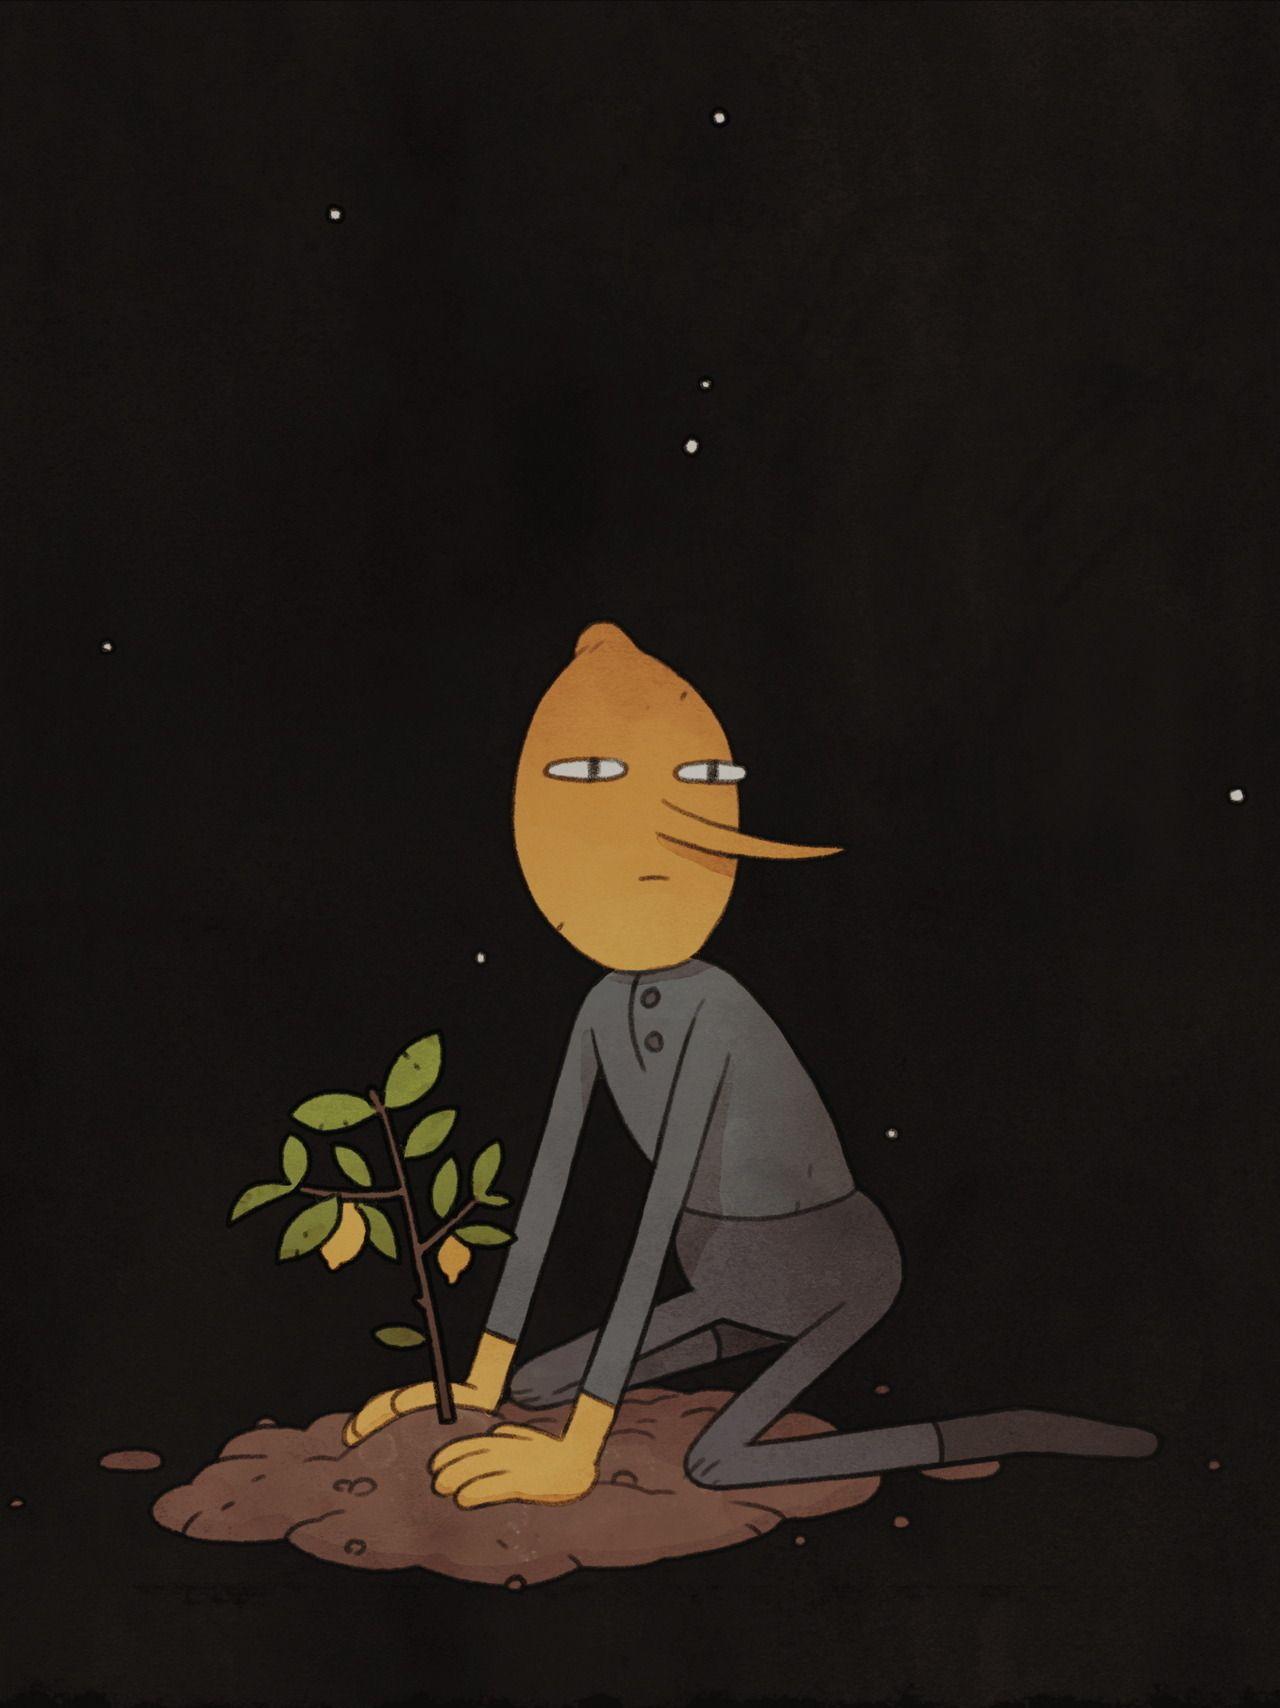 Art And Comics By Wrenwrenfarren Gmail Com Adventure Time Marceline Adventure Time Cartoon Adventure Time Drawings